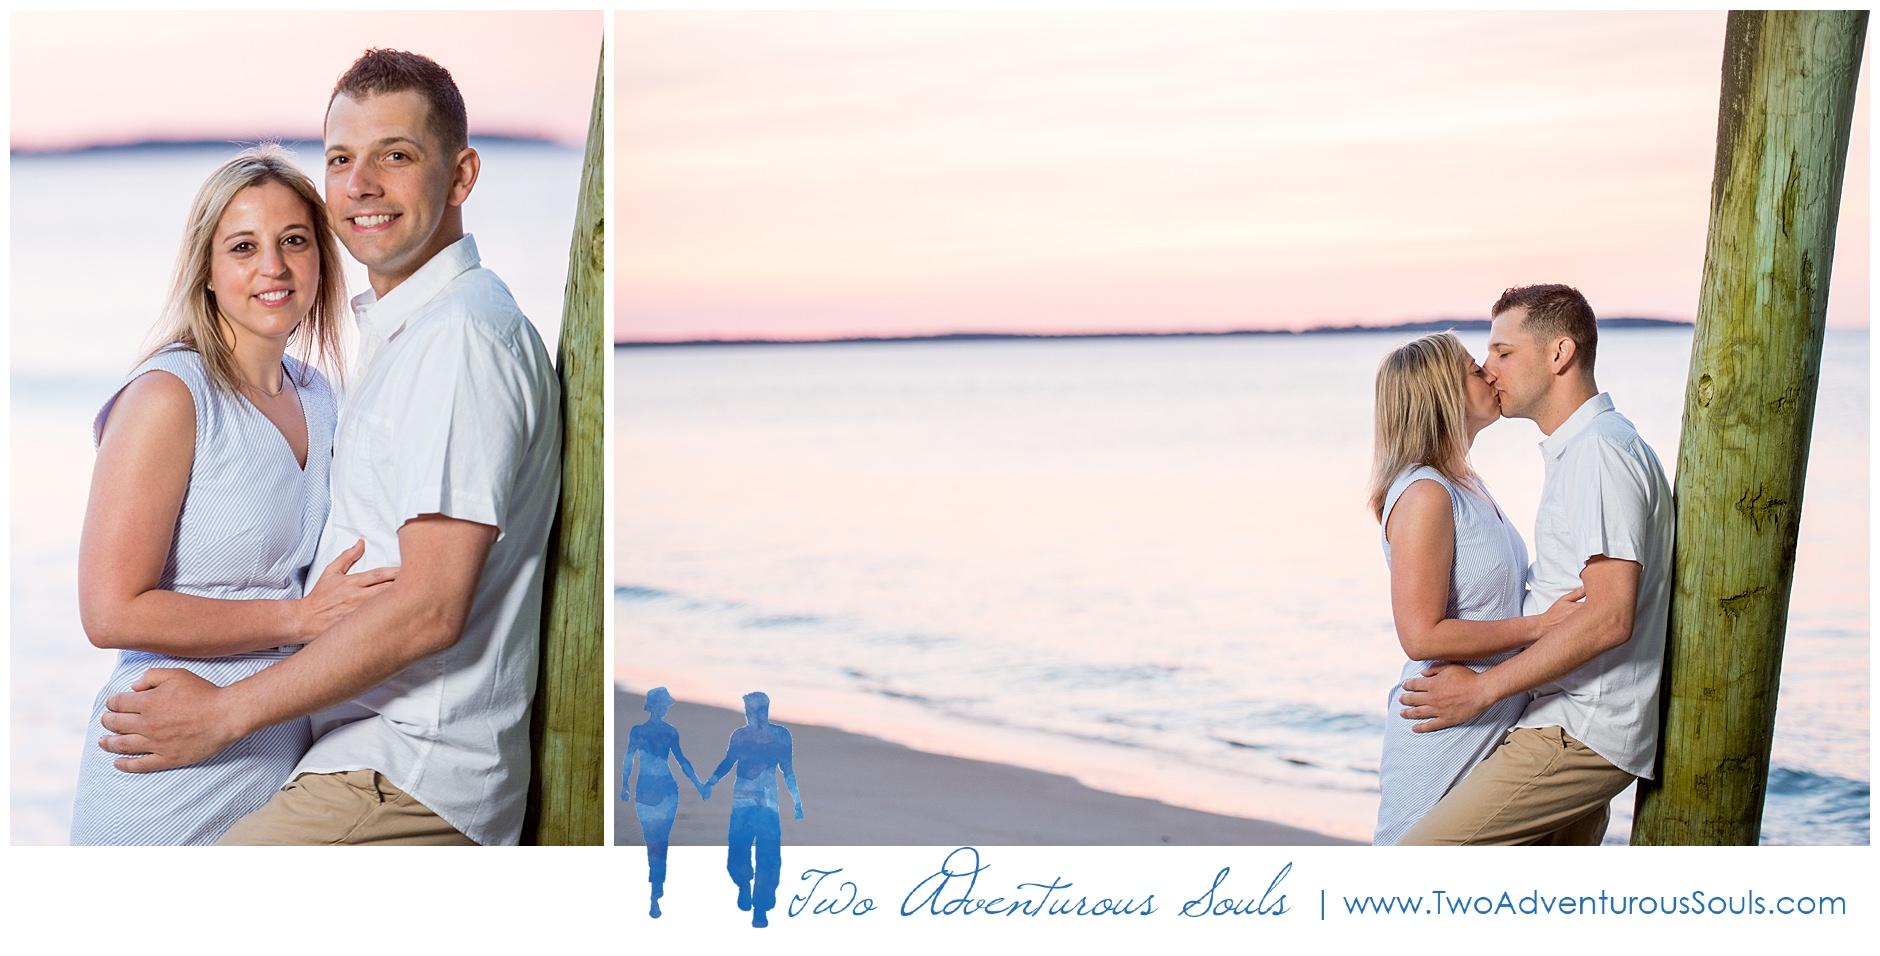 Maine Wedding Photographers, Connecticut Wedding Photographers, Old Orchard Beach Wedding Photographers, Two Adventurous Souls-JustinElise_0005.jpg